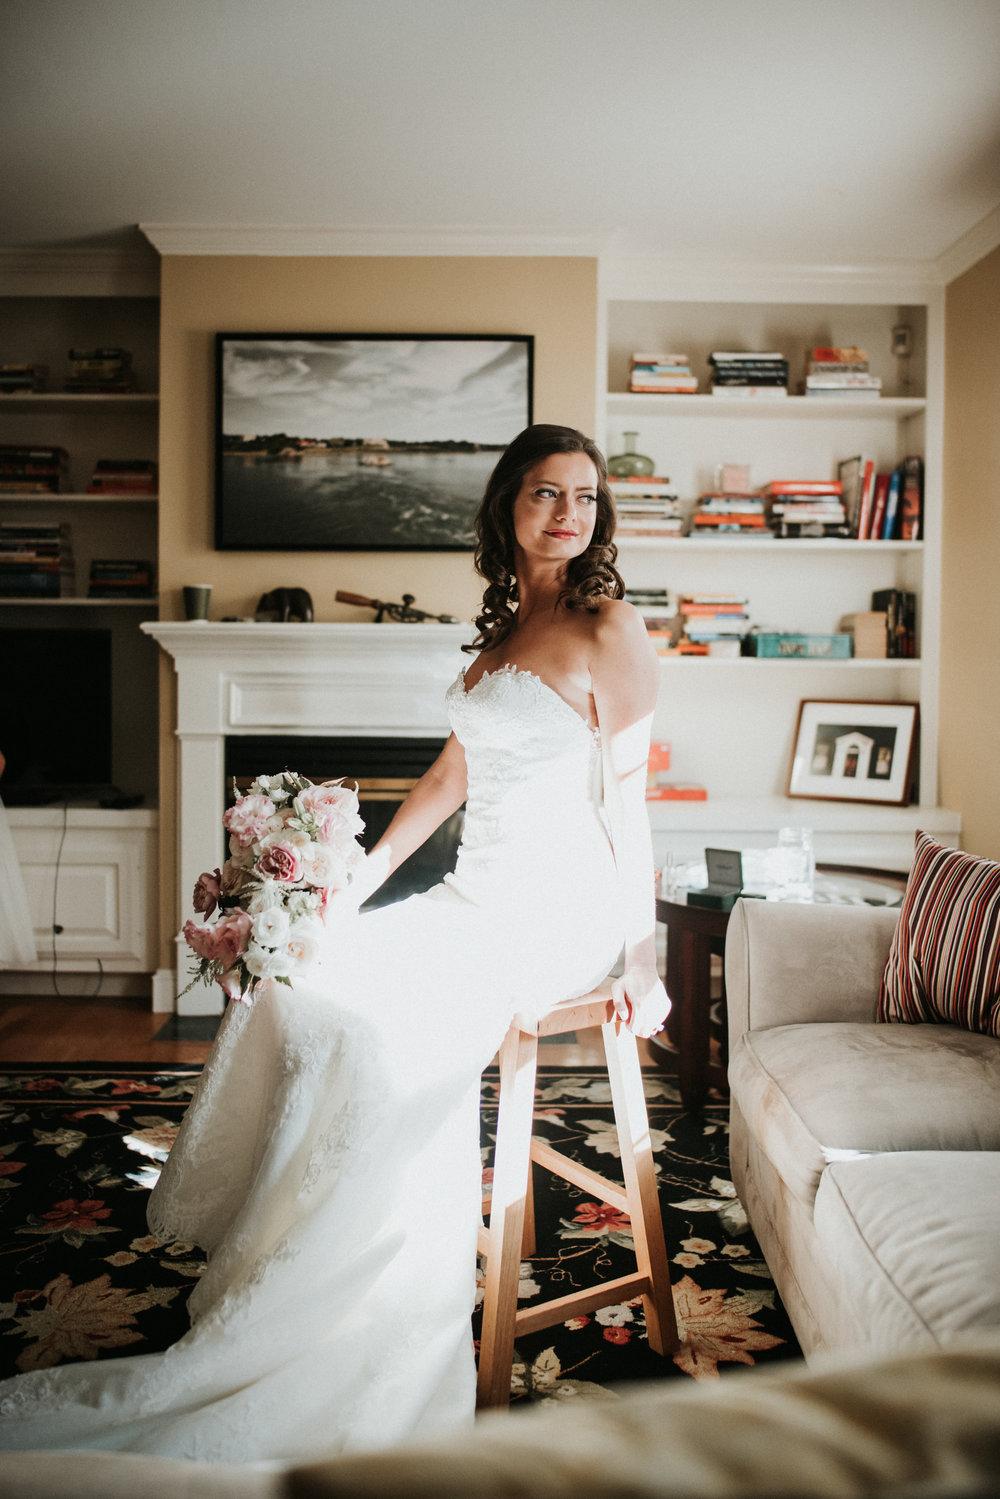 Rosecliff-Mansion-Wedding-Newport-16.jpg